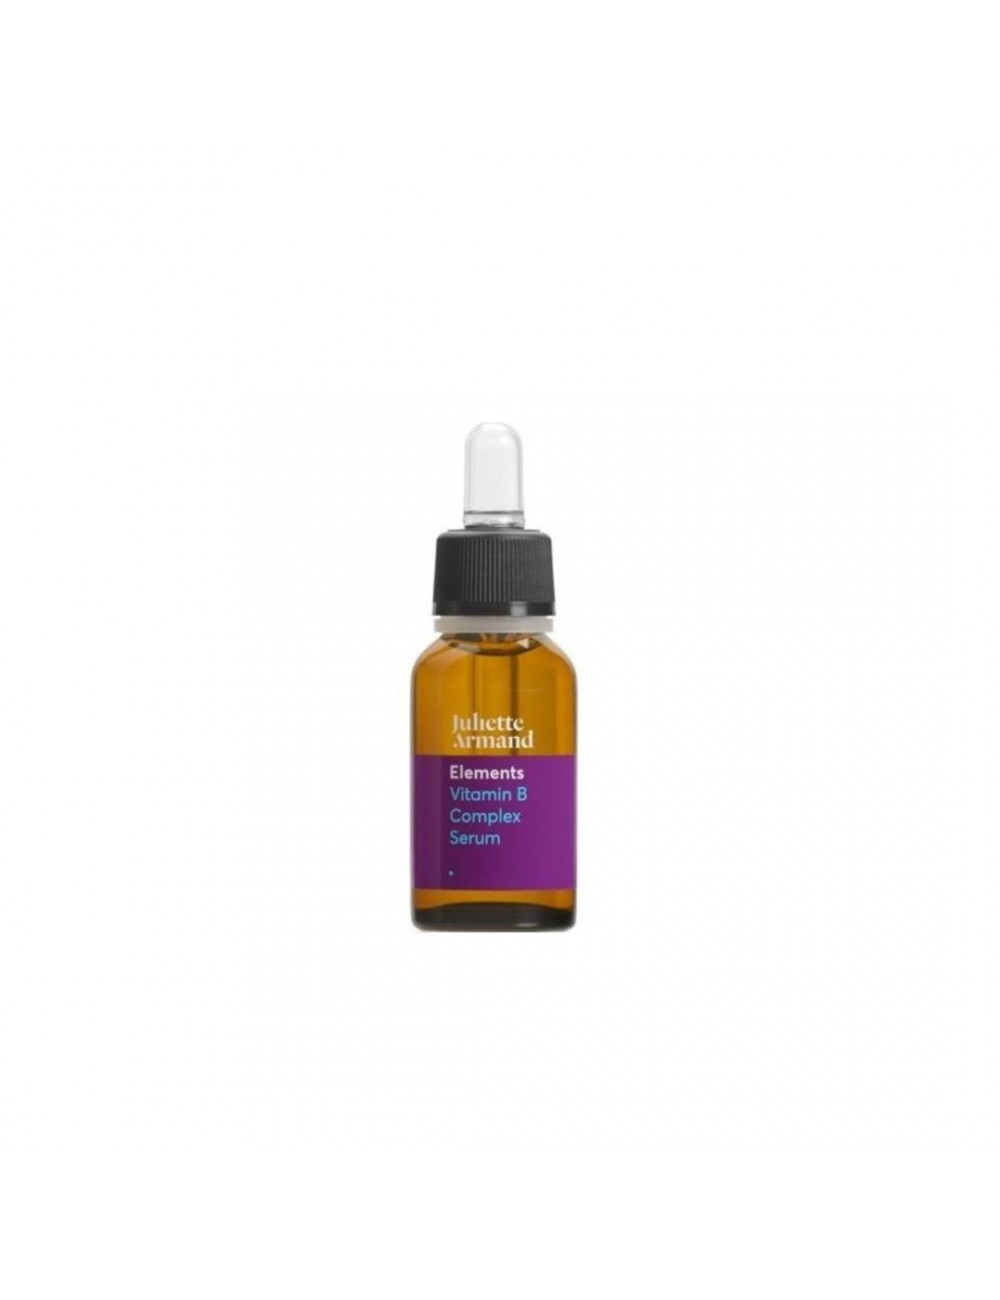 Juliette Armand Vitamin B Complex Serum (20ml)